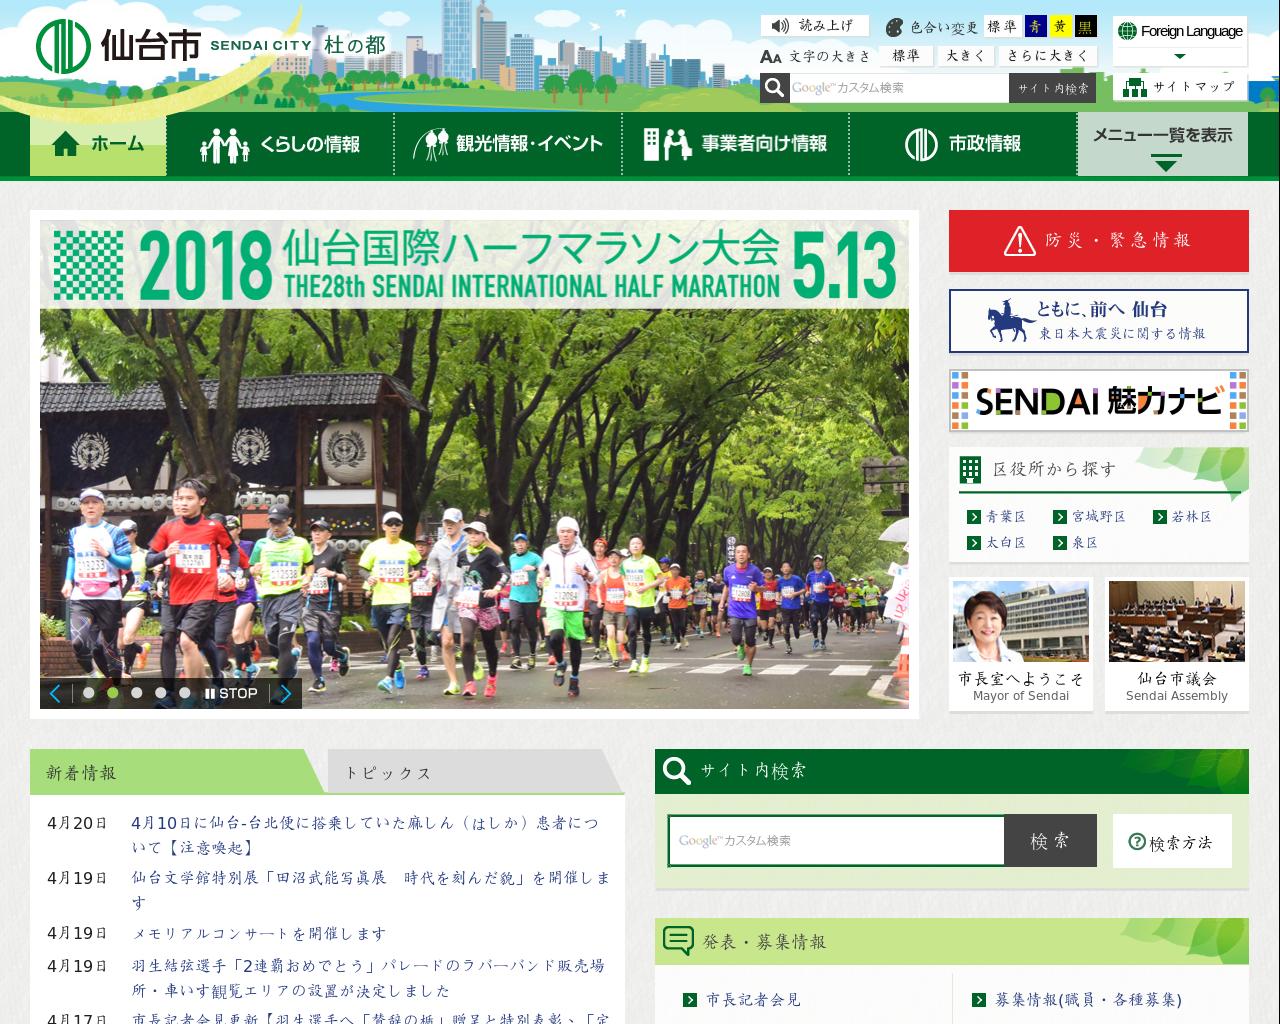 www.city.sendai.jp(2018/04/22 14:11:41)